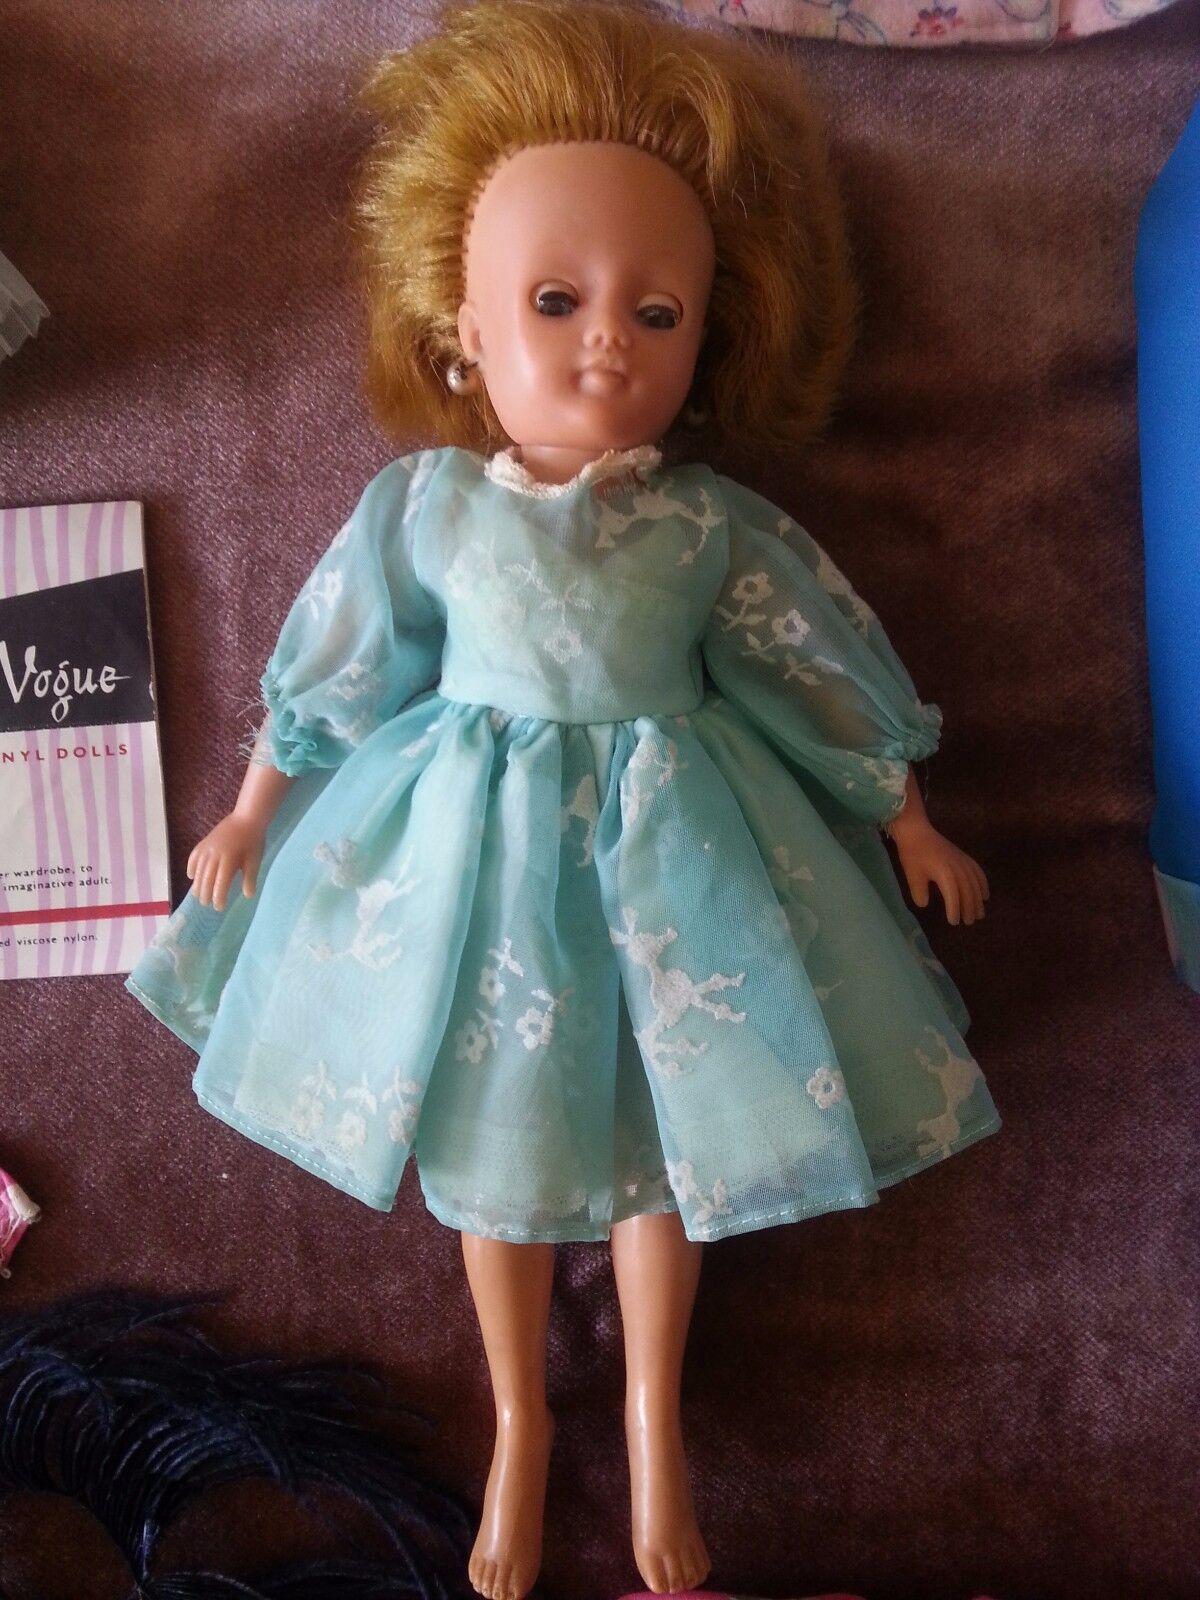 1959 Pedigree Little Miss Vogue 10  doll wearing original Kleid